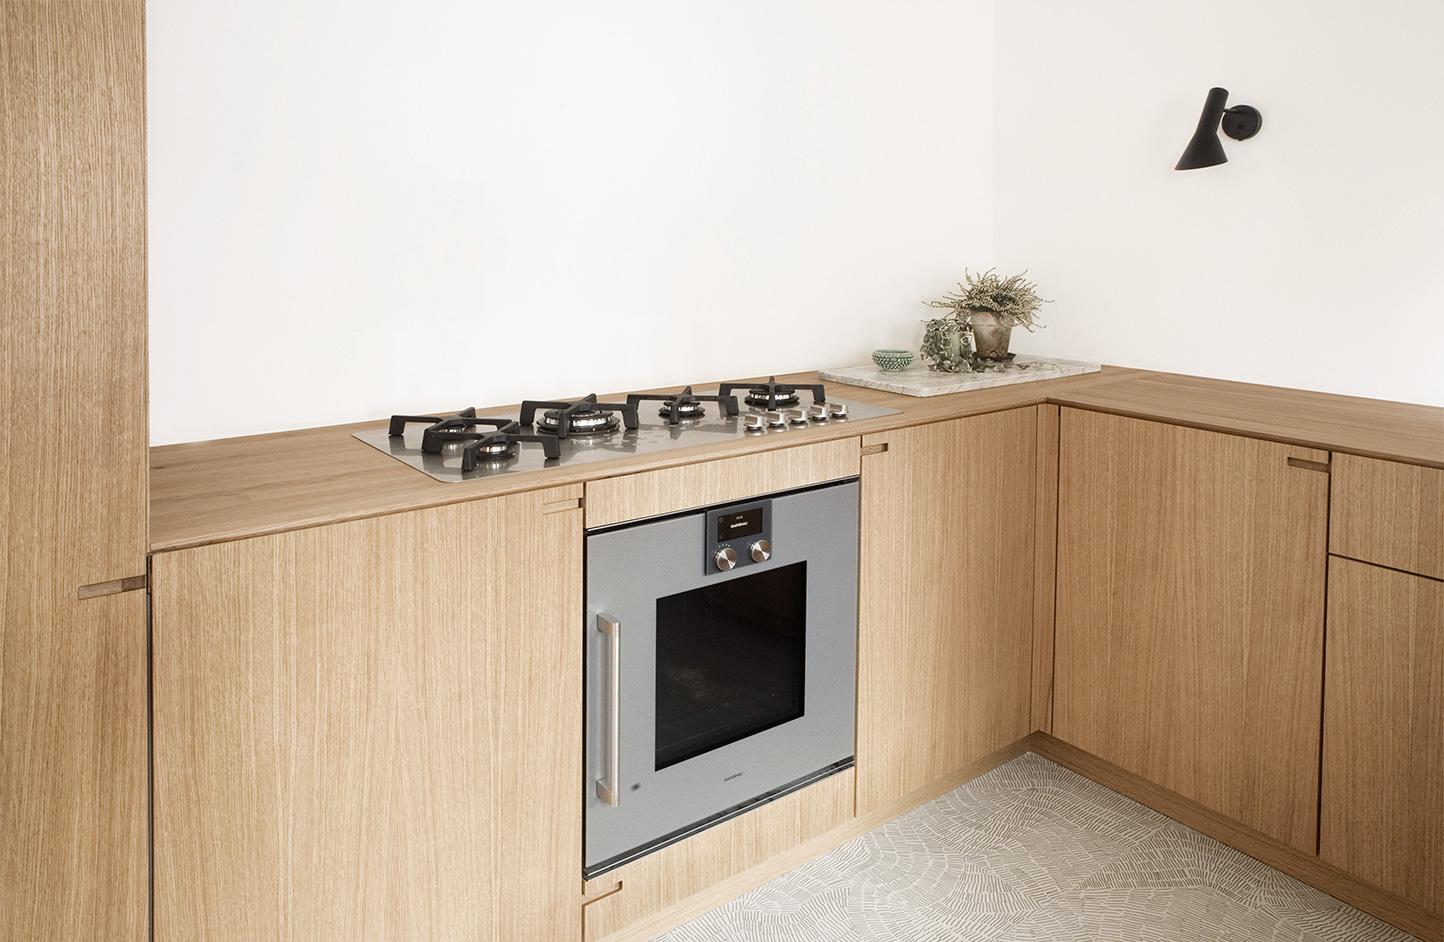 Bespoke Kitchen design by cabinet maker Nicolaj Bo, Copenhagen